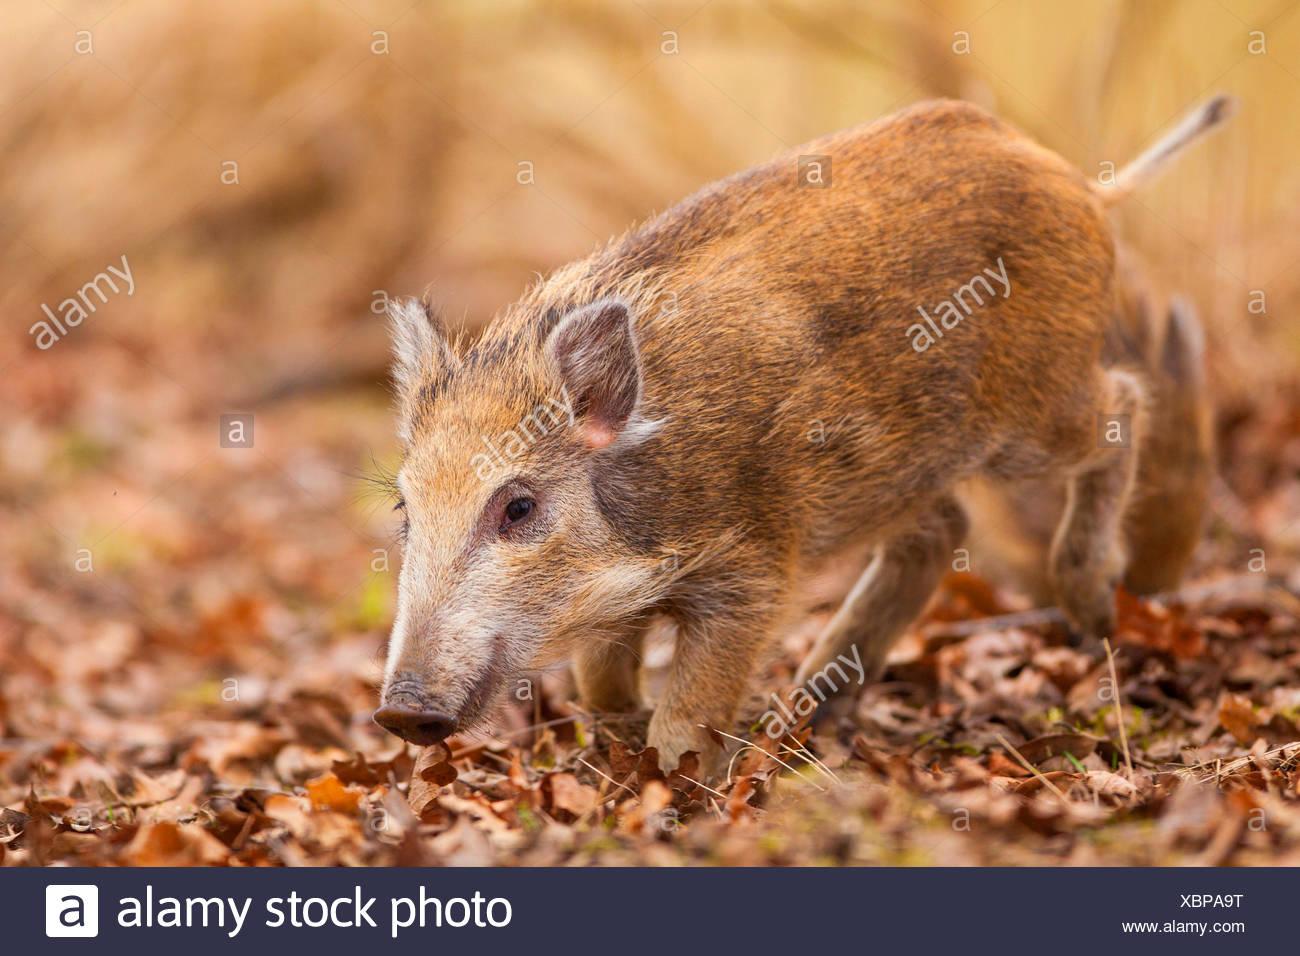 wild boar, pig, wild boar (Sus scrofa), runt, Germany, Rhineland-Palatinate - Stock Image